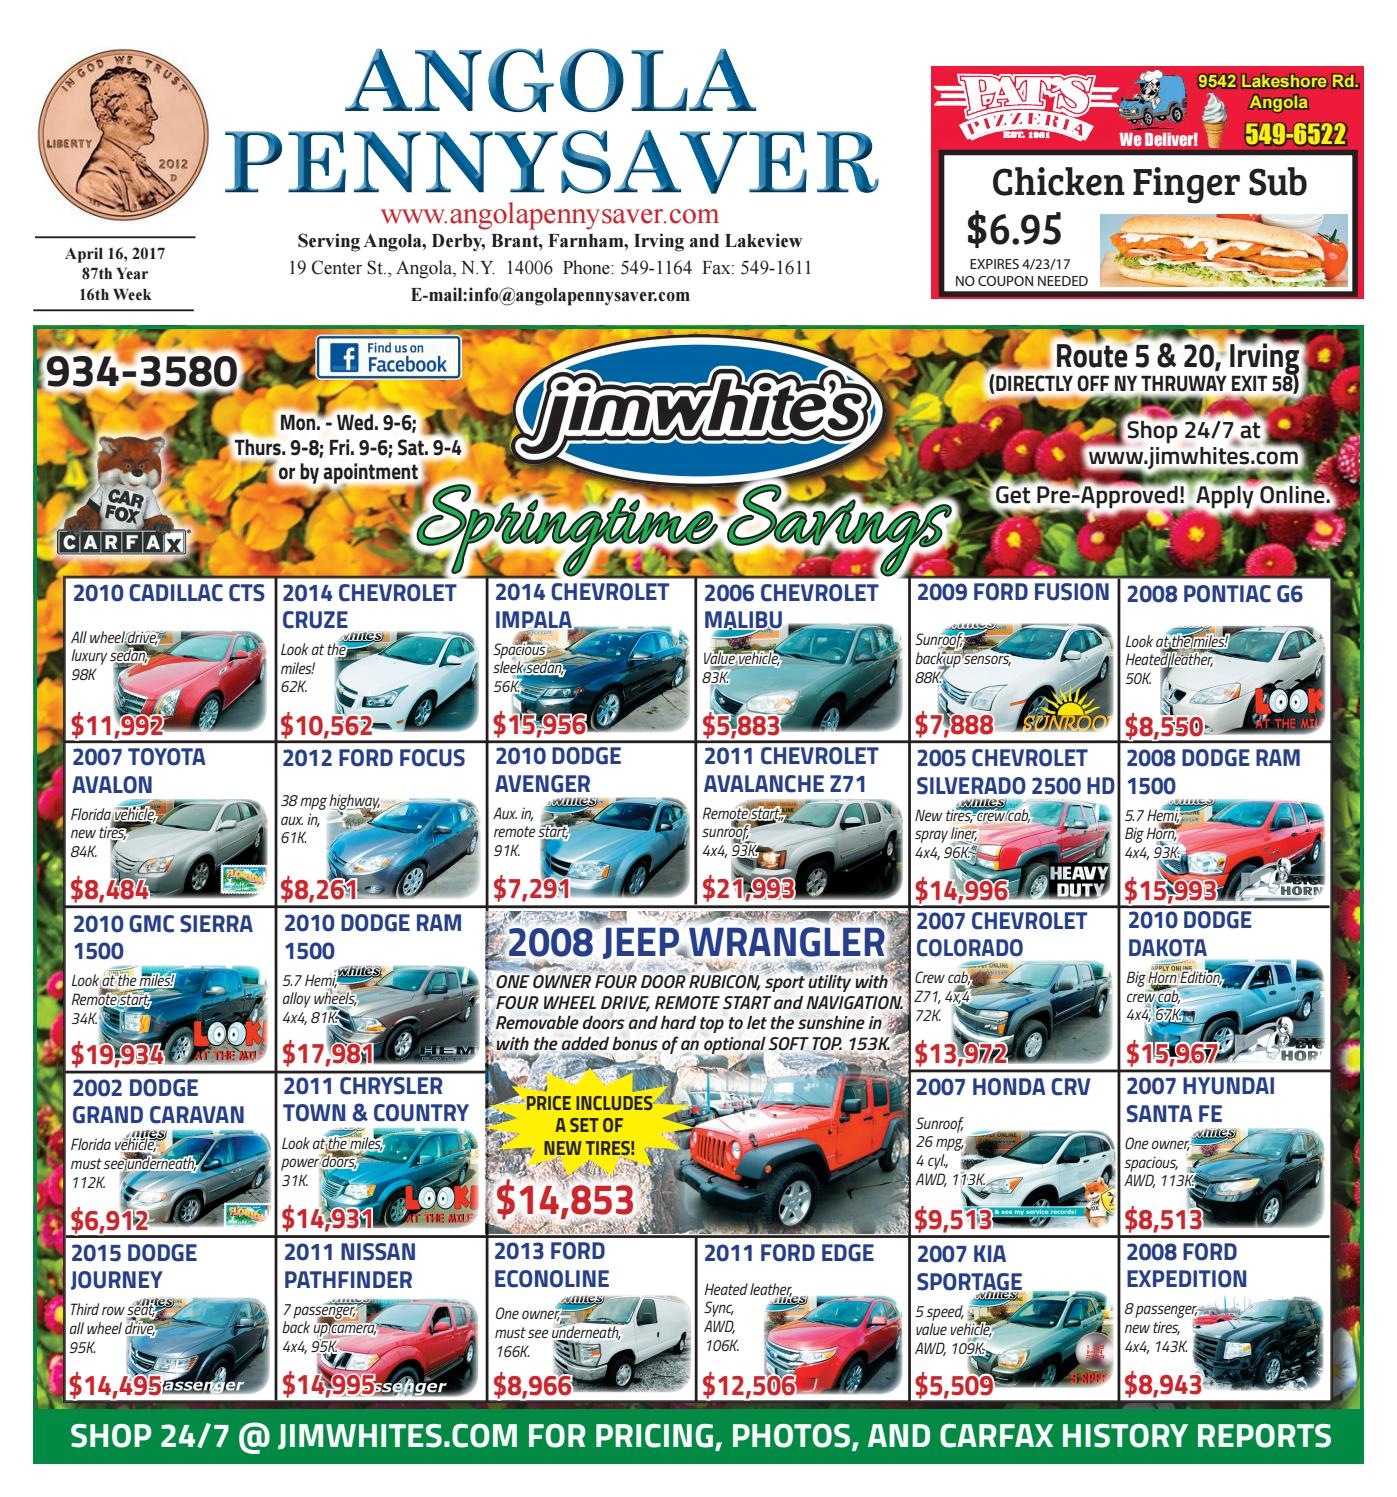 4/16/17 Angola Pennysaver by Angola Pennysaver - issuu